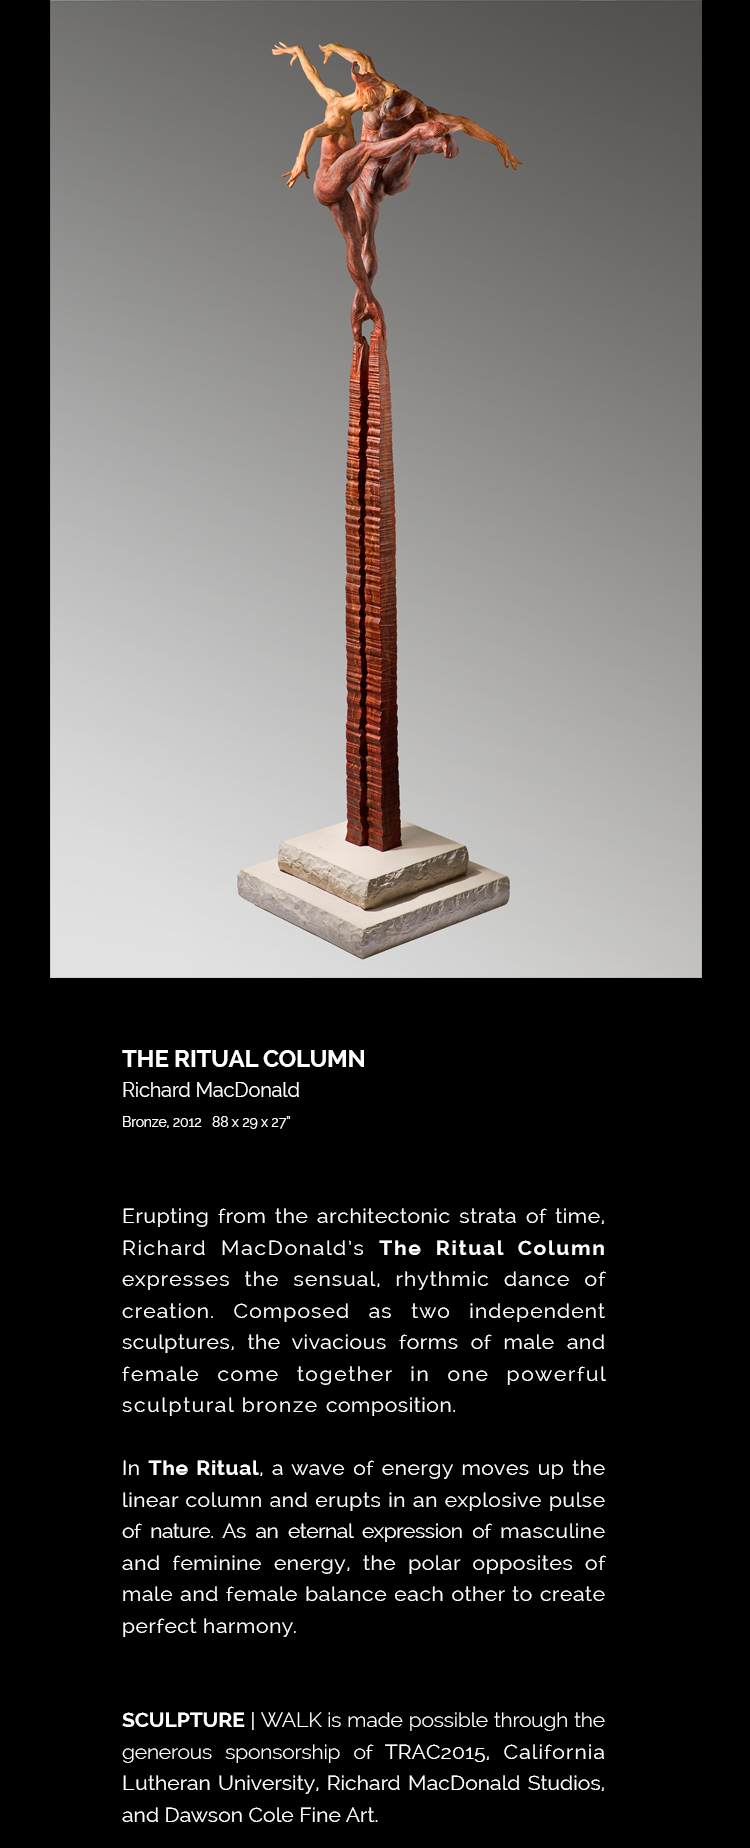 The Ritual Column by Richard MacDonald